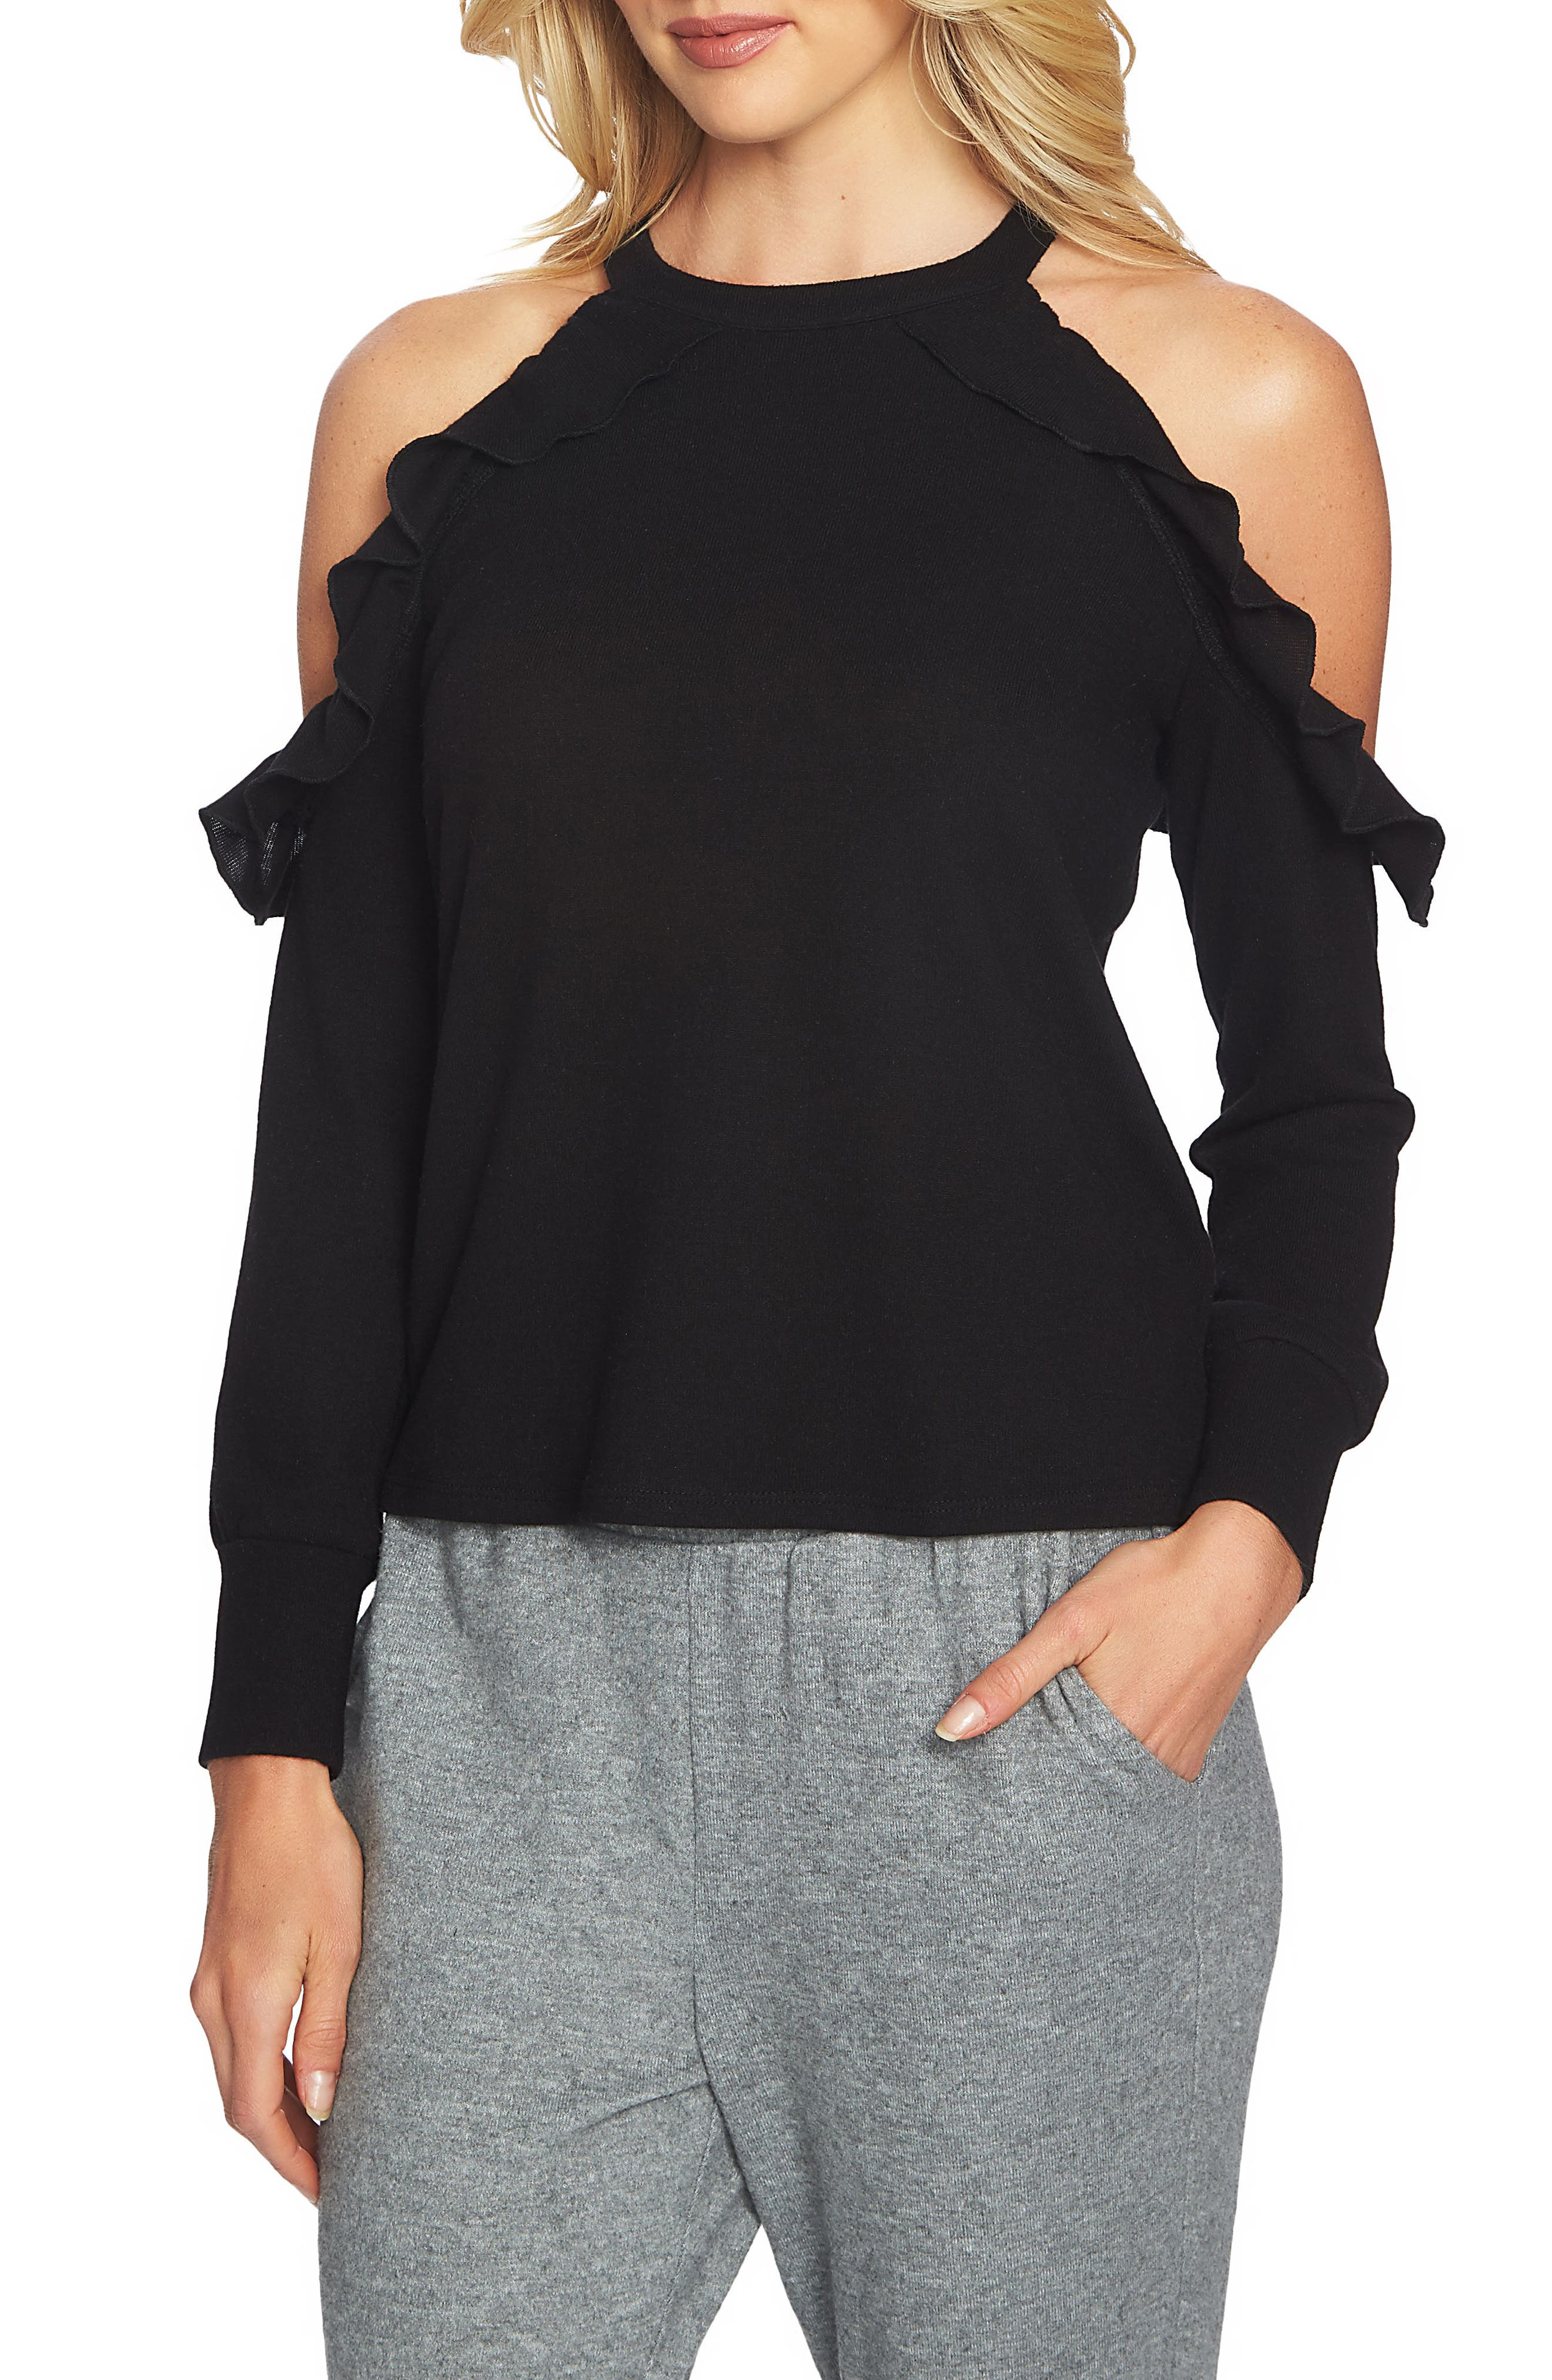 The Cozy Cold Shoulder Knit Top,                             Main thumbnail 1, color,                             010